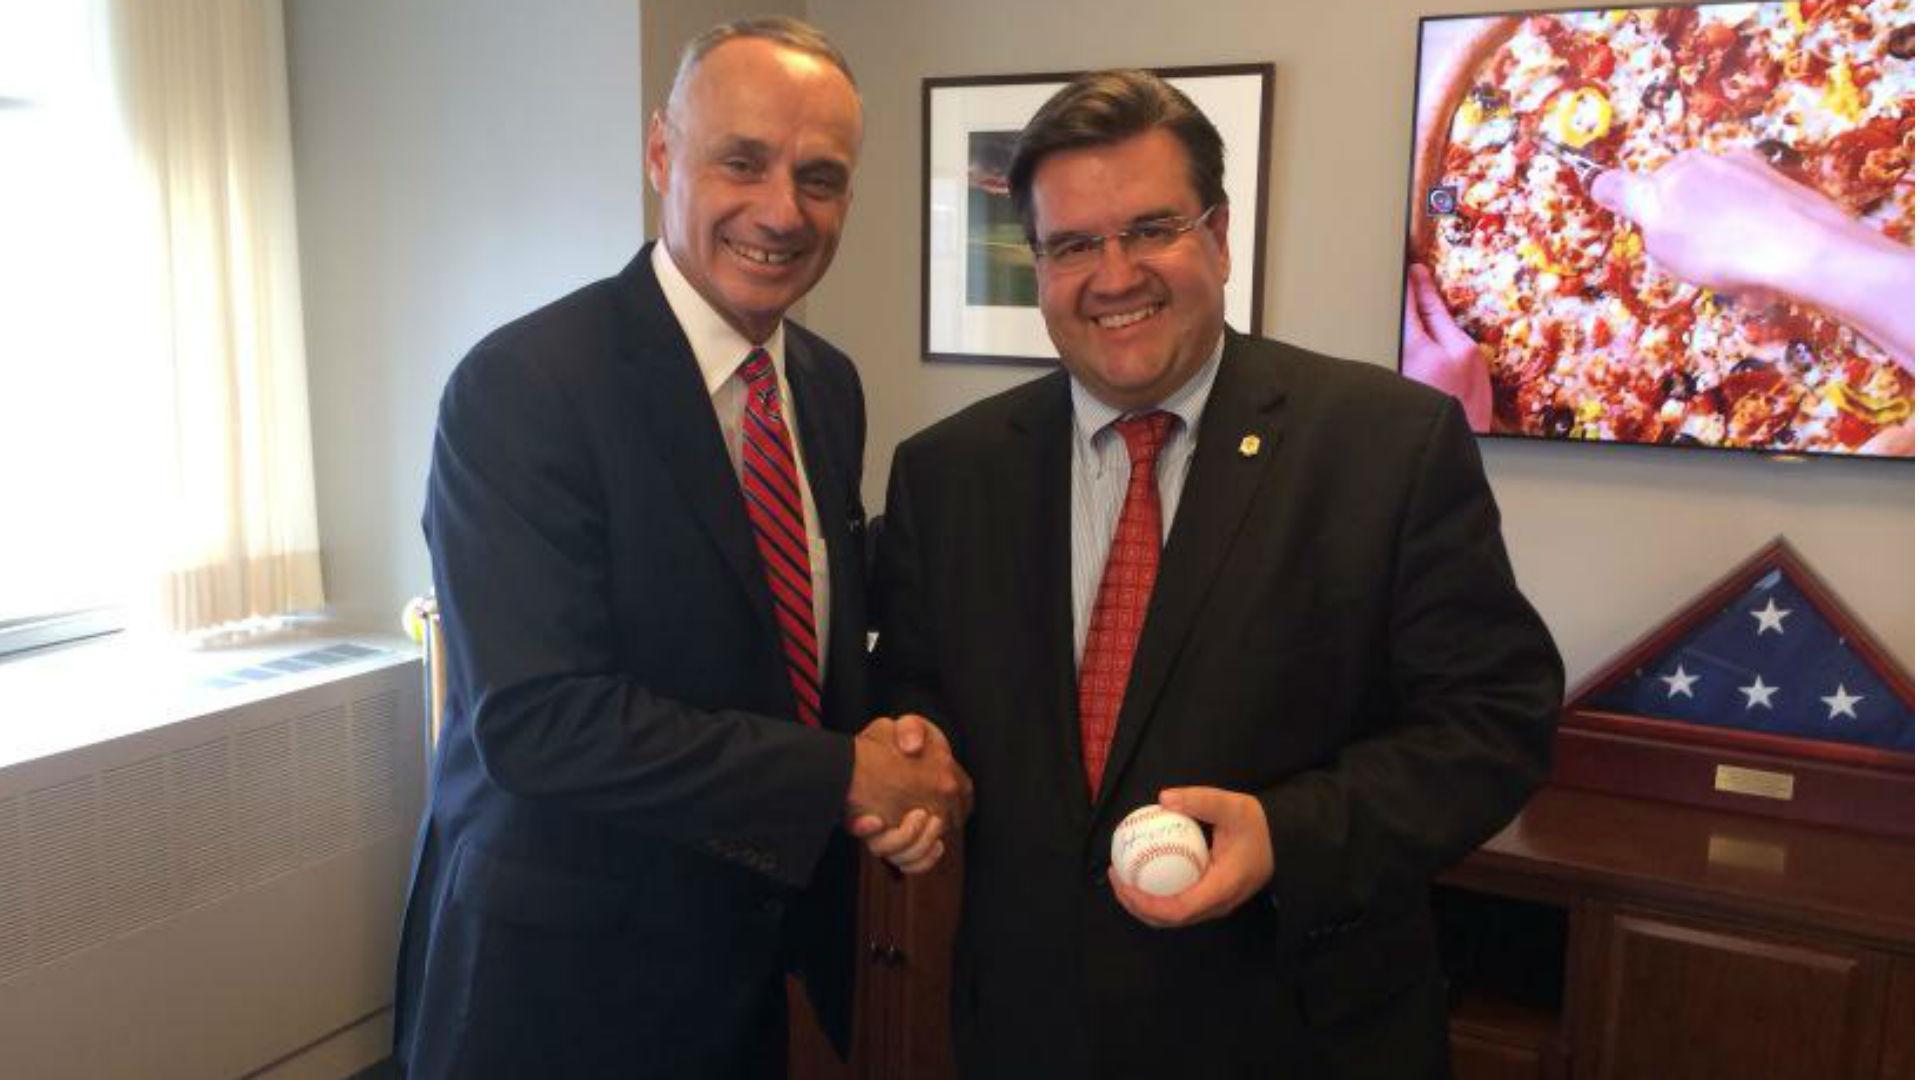 Montreal mayor wants MLB regular-season games in city